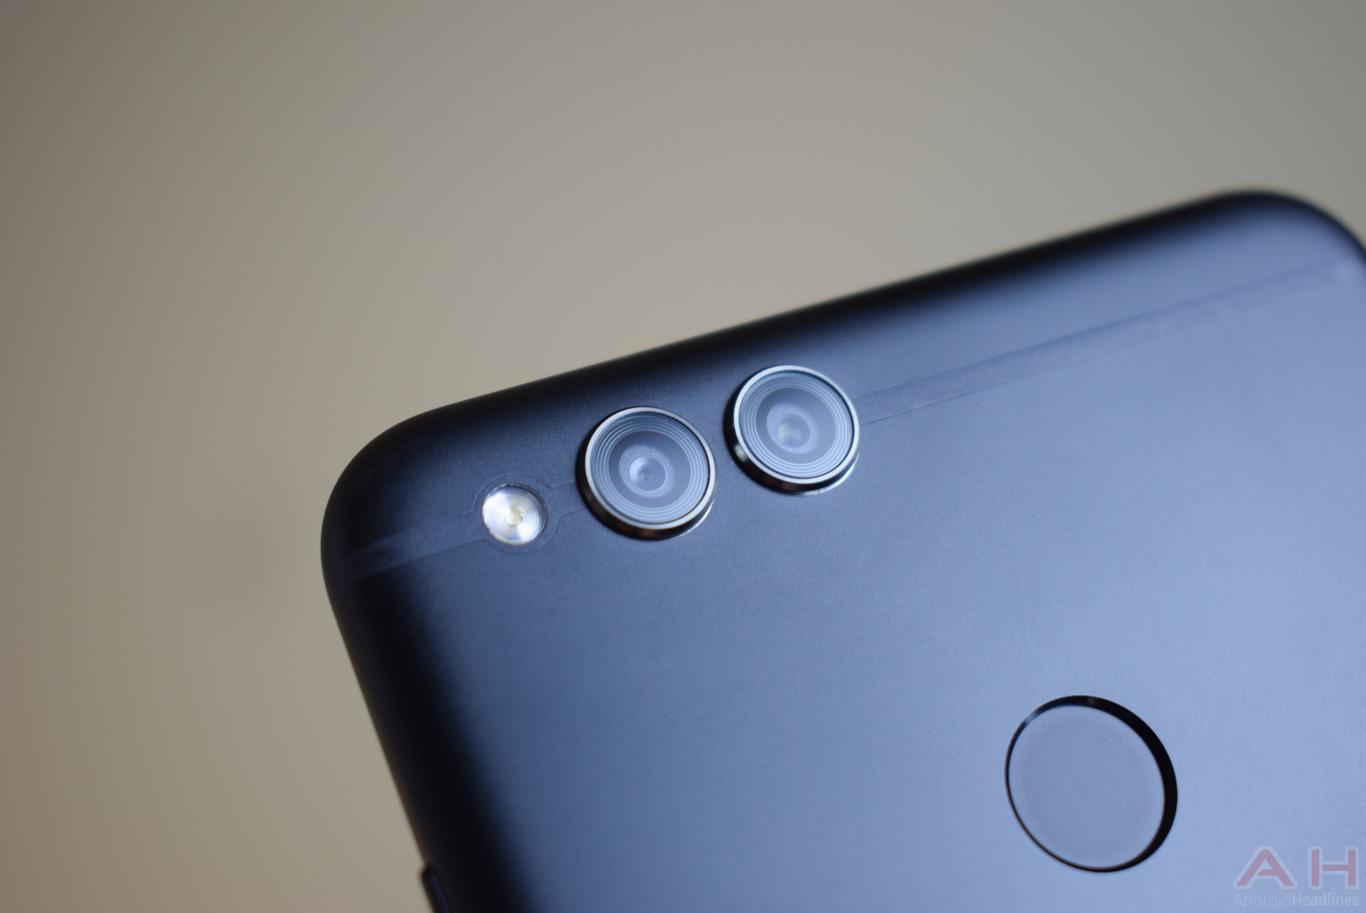 Hands-On With Honor 7X: 18:9 Display, Fast Fingerprint Sensor For Under $200